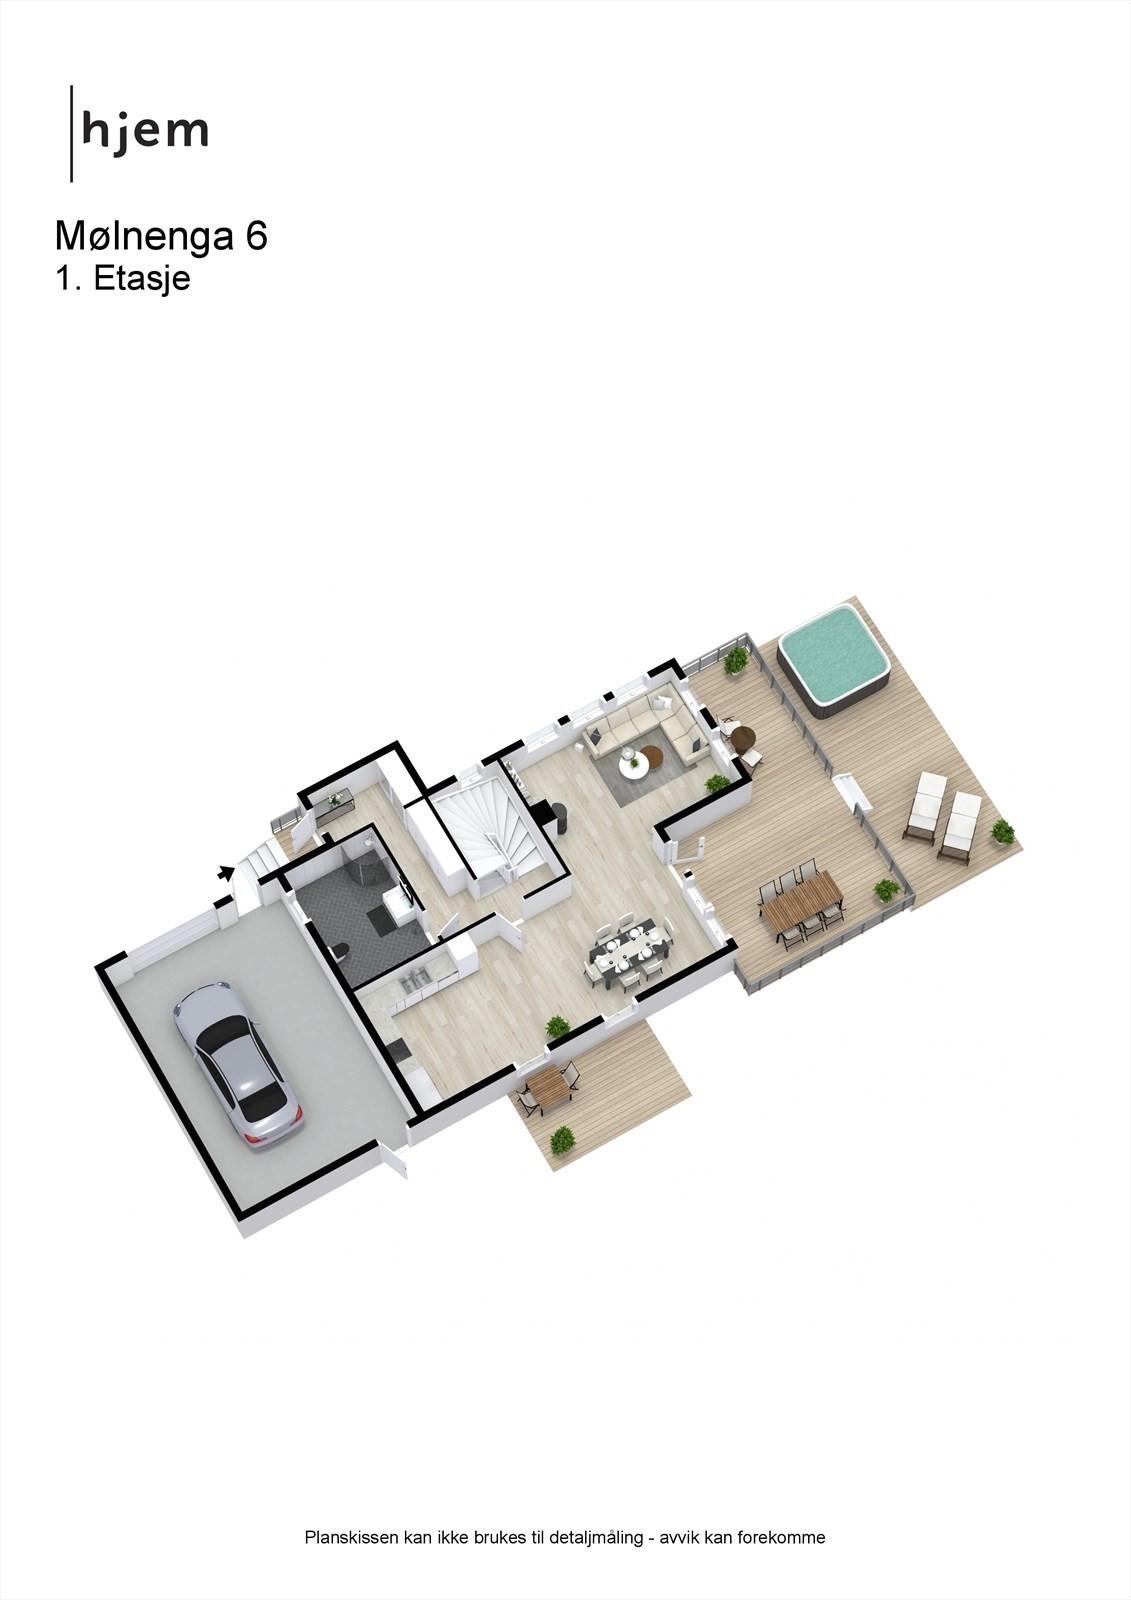 Mølnenga 6 - 3D - 1. Etasje - Letterhead.jpg